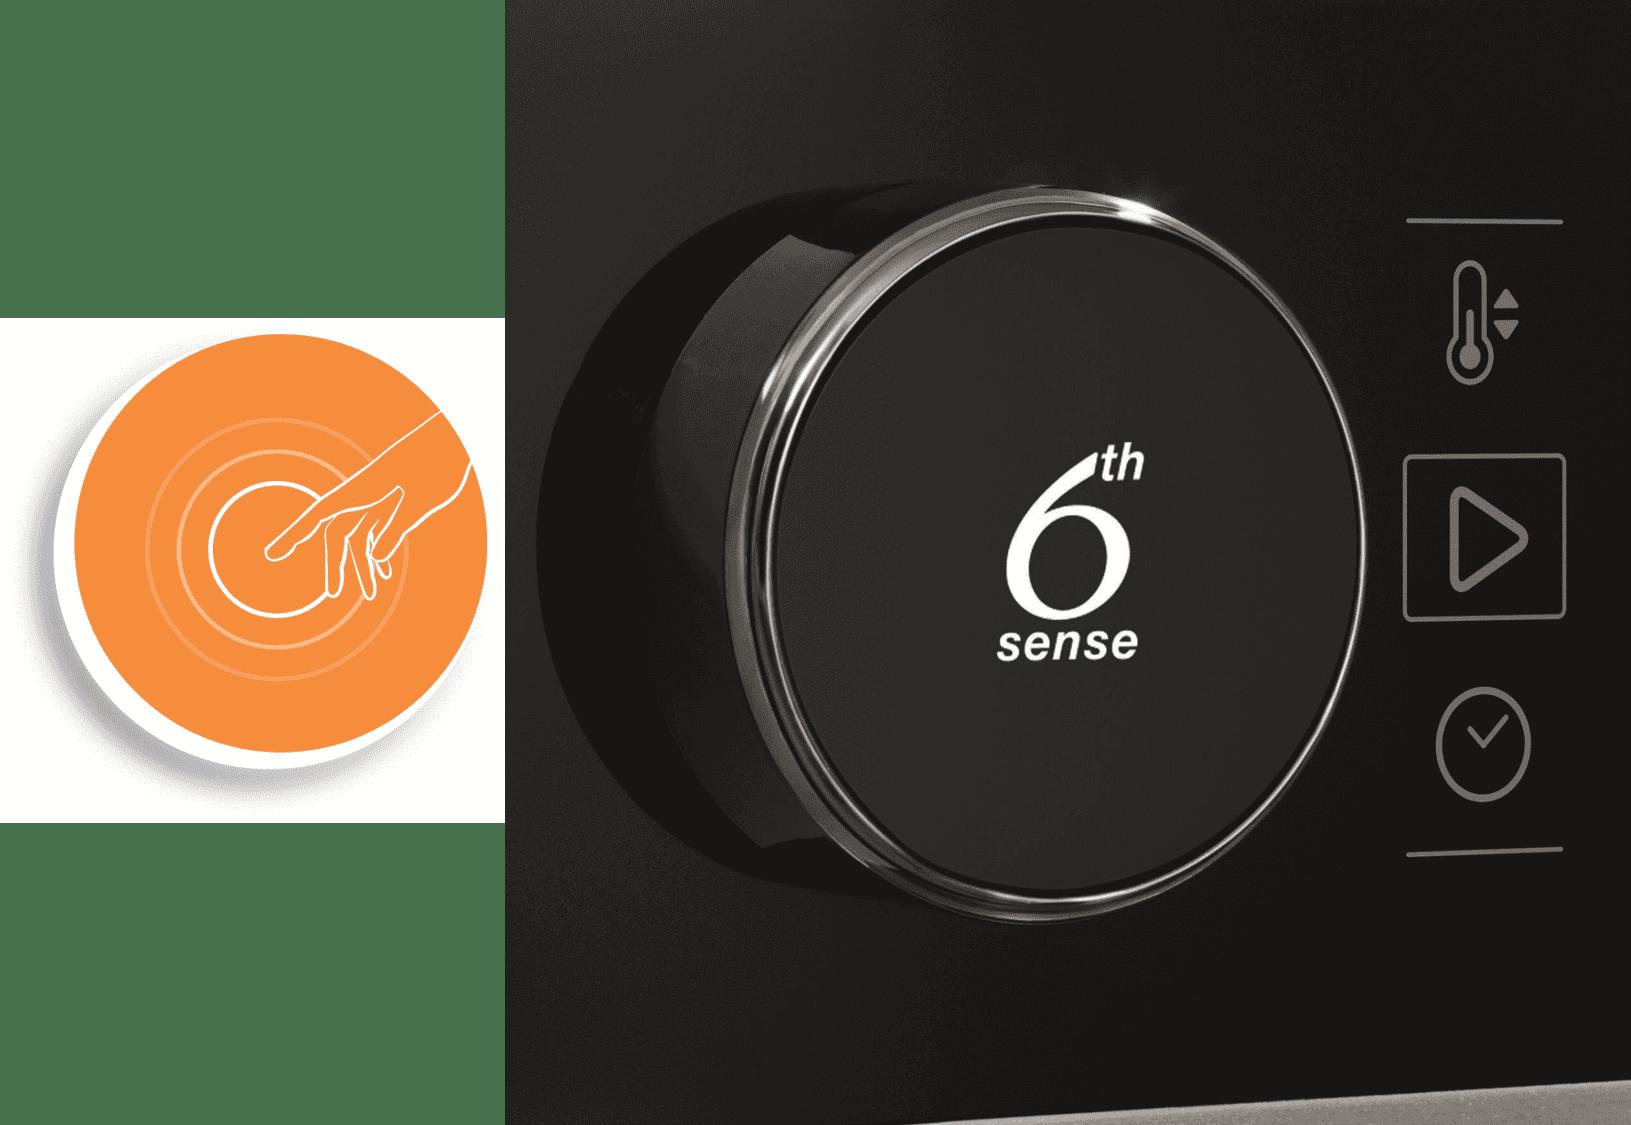 Four Micro Ondes Encastrable Whirlpool Amw730ix 6ème Sens Inox